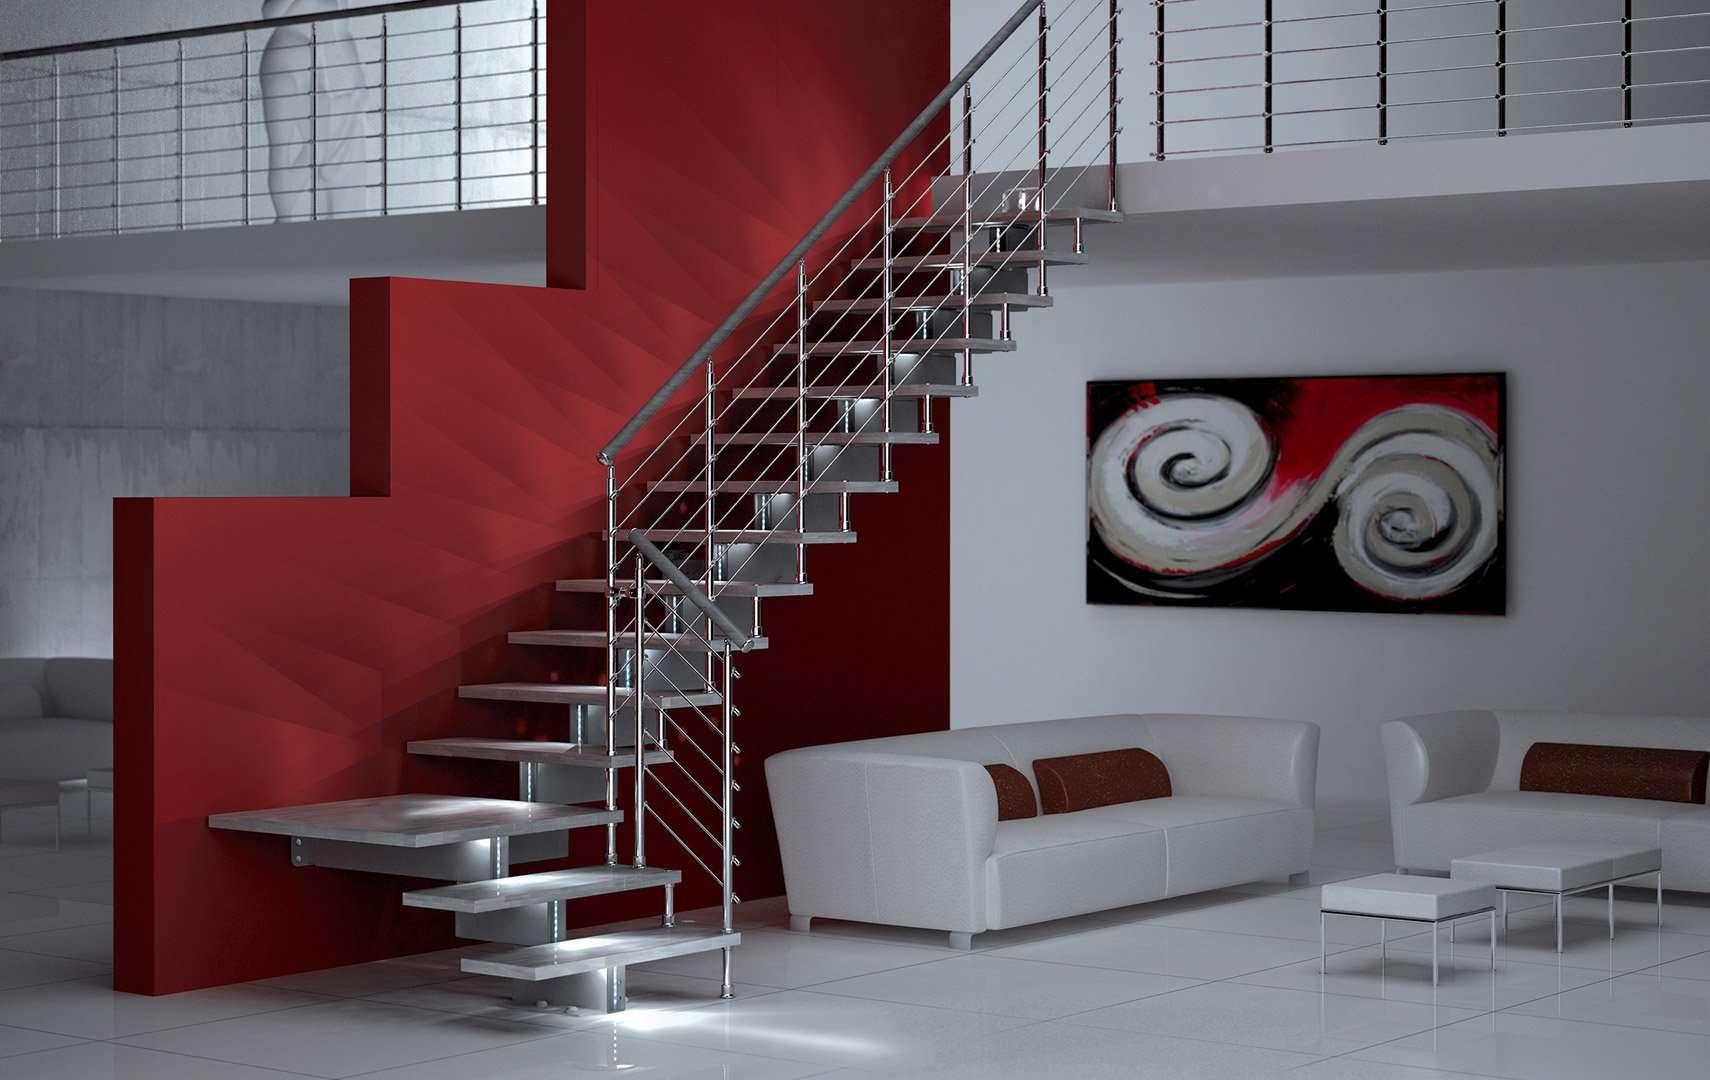 ᐅ visiona le immagini di scale interne luci a led scale interne